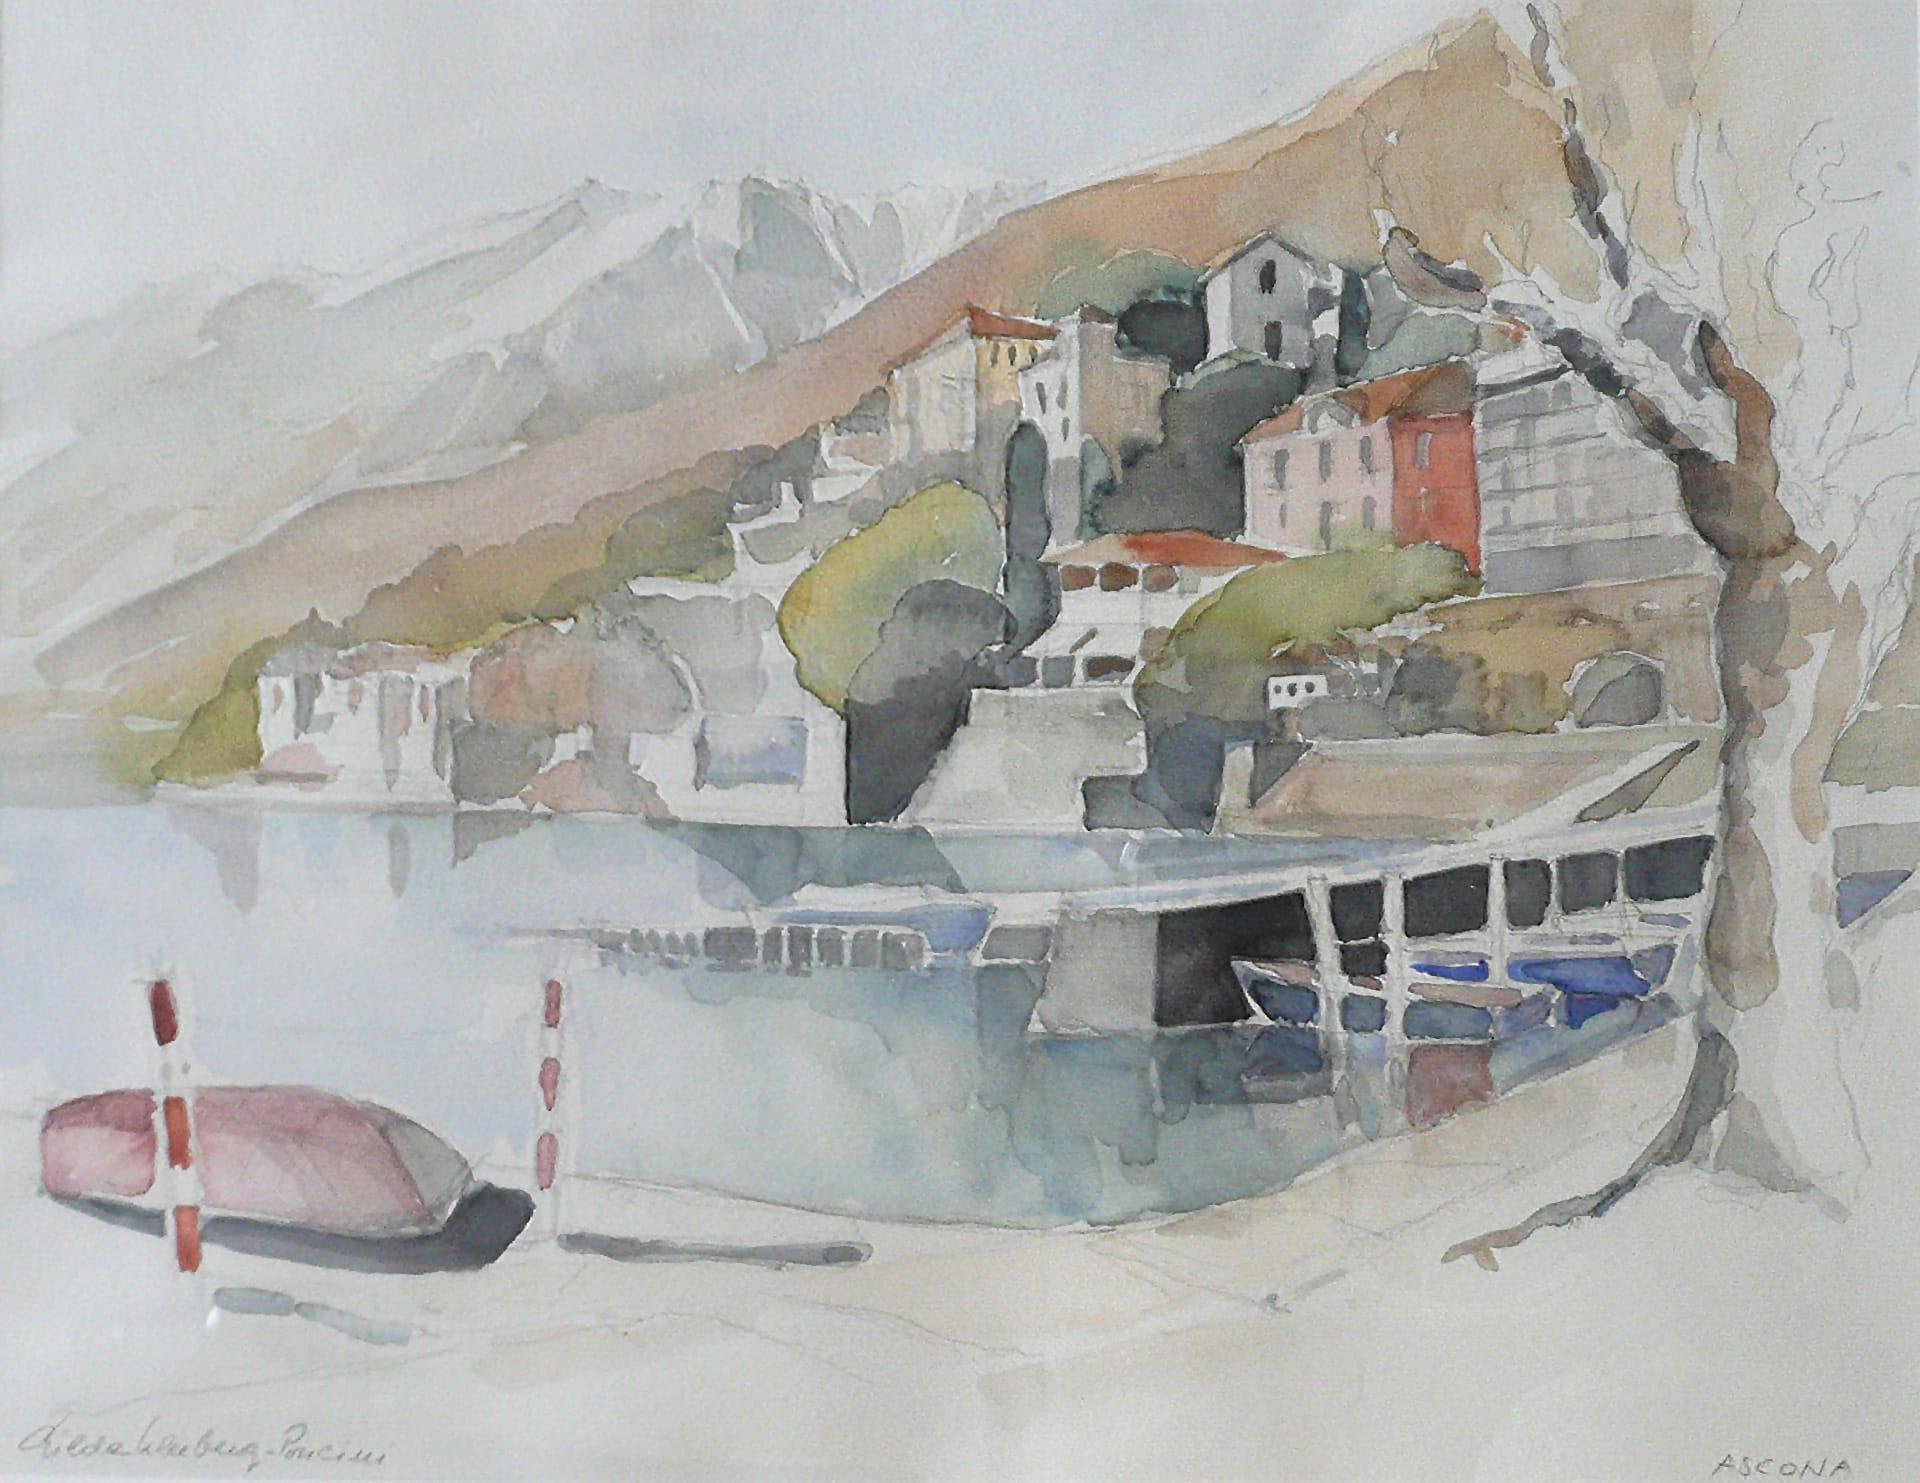 Gilda Kleeberg-Poncini: Ascona Tessin